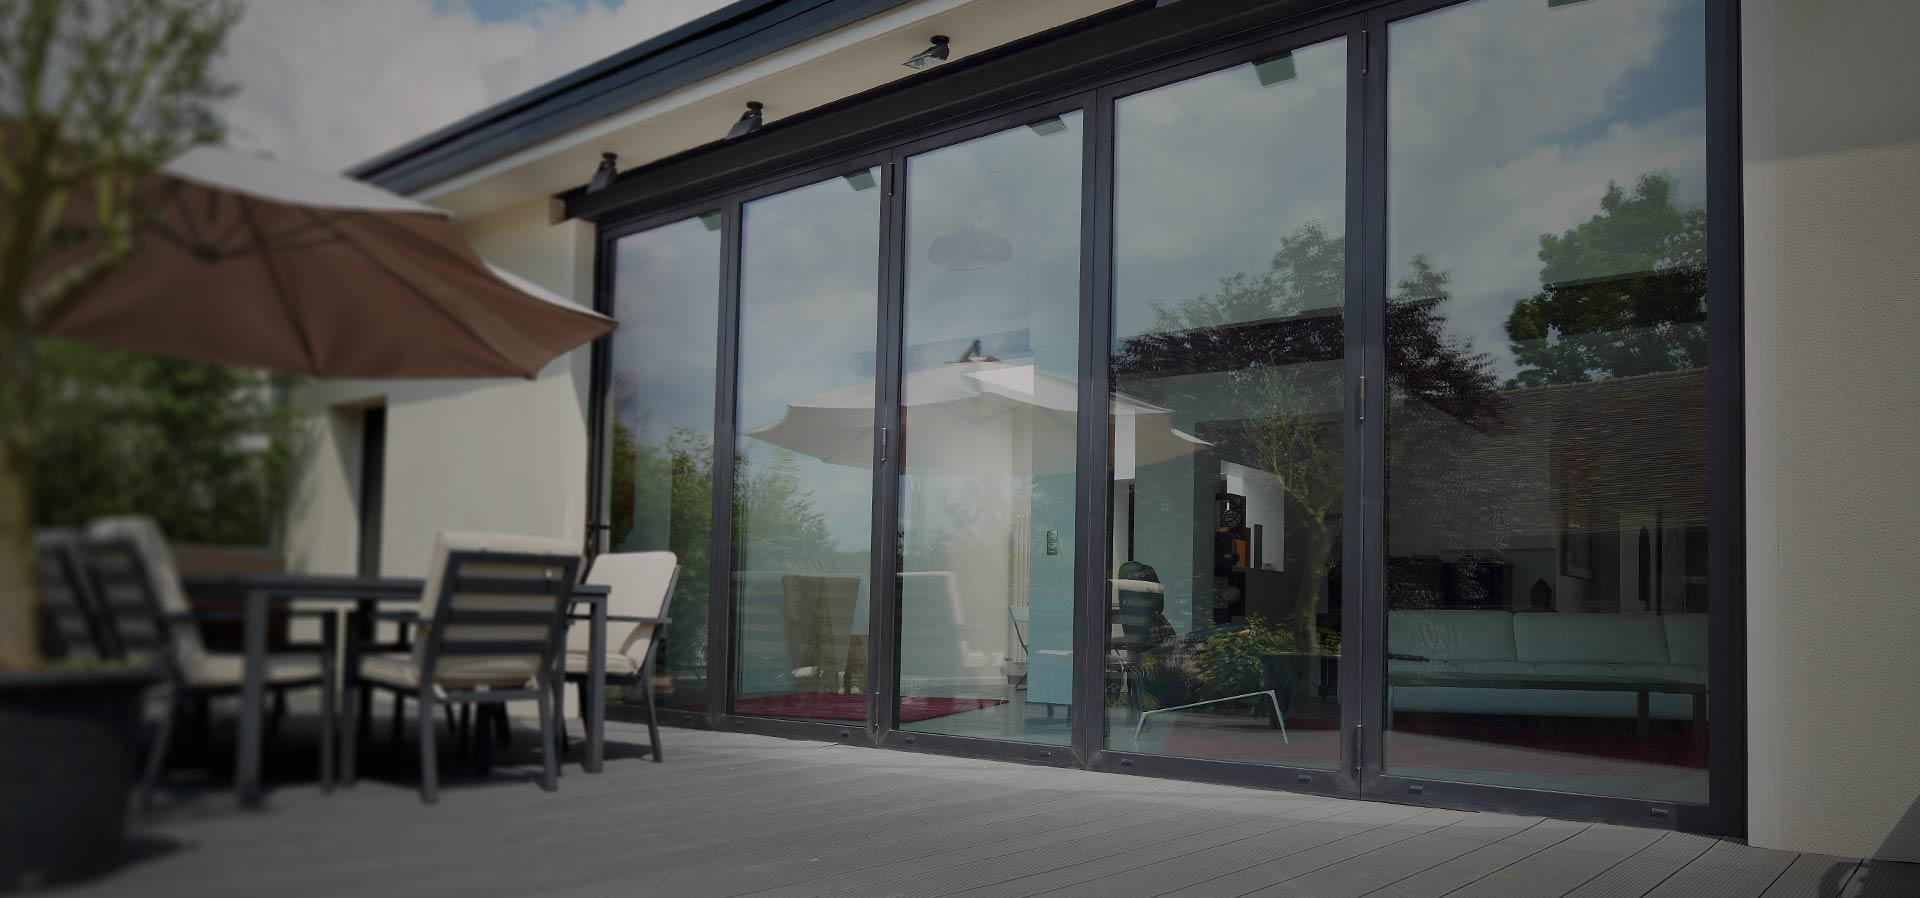 Wide span of Raum aluminium bifold doors over looking the patio area